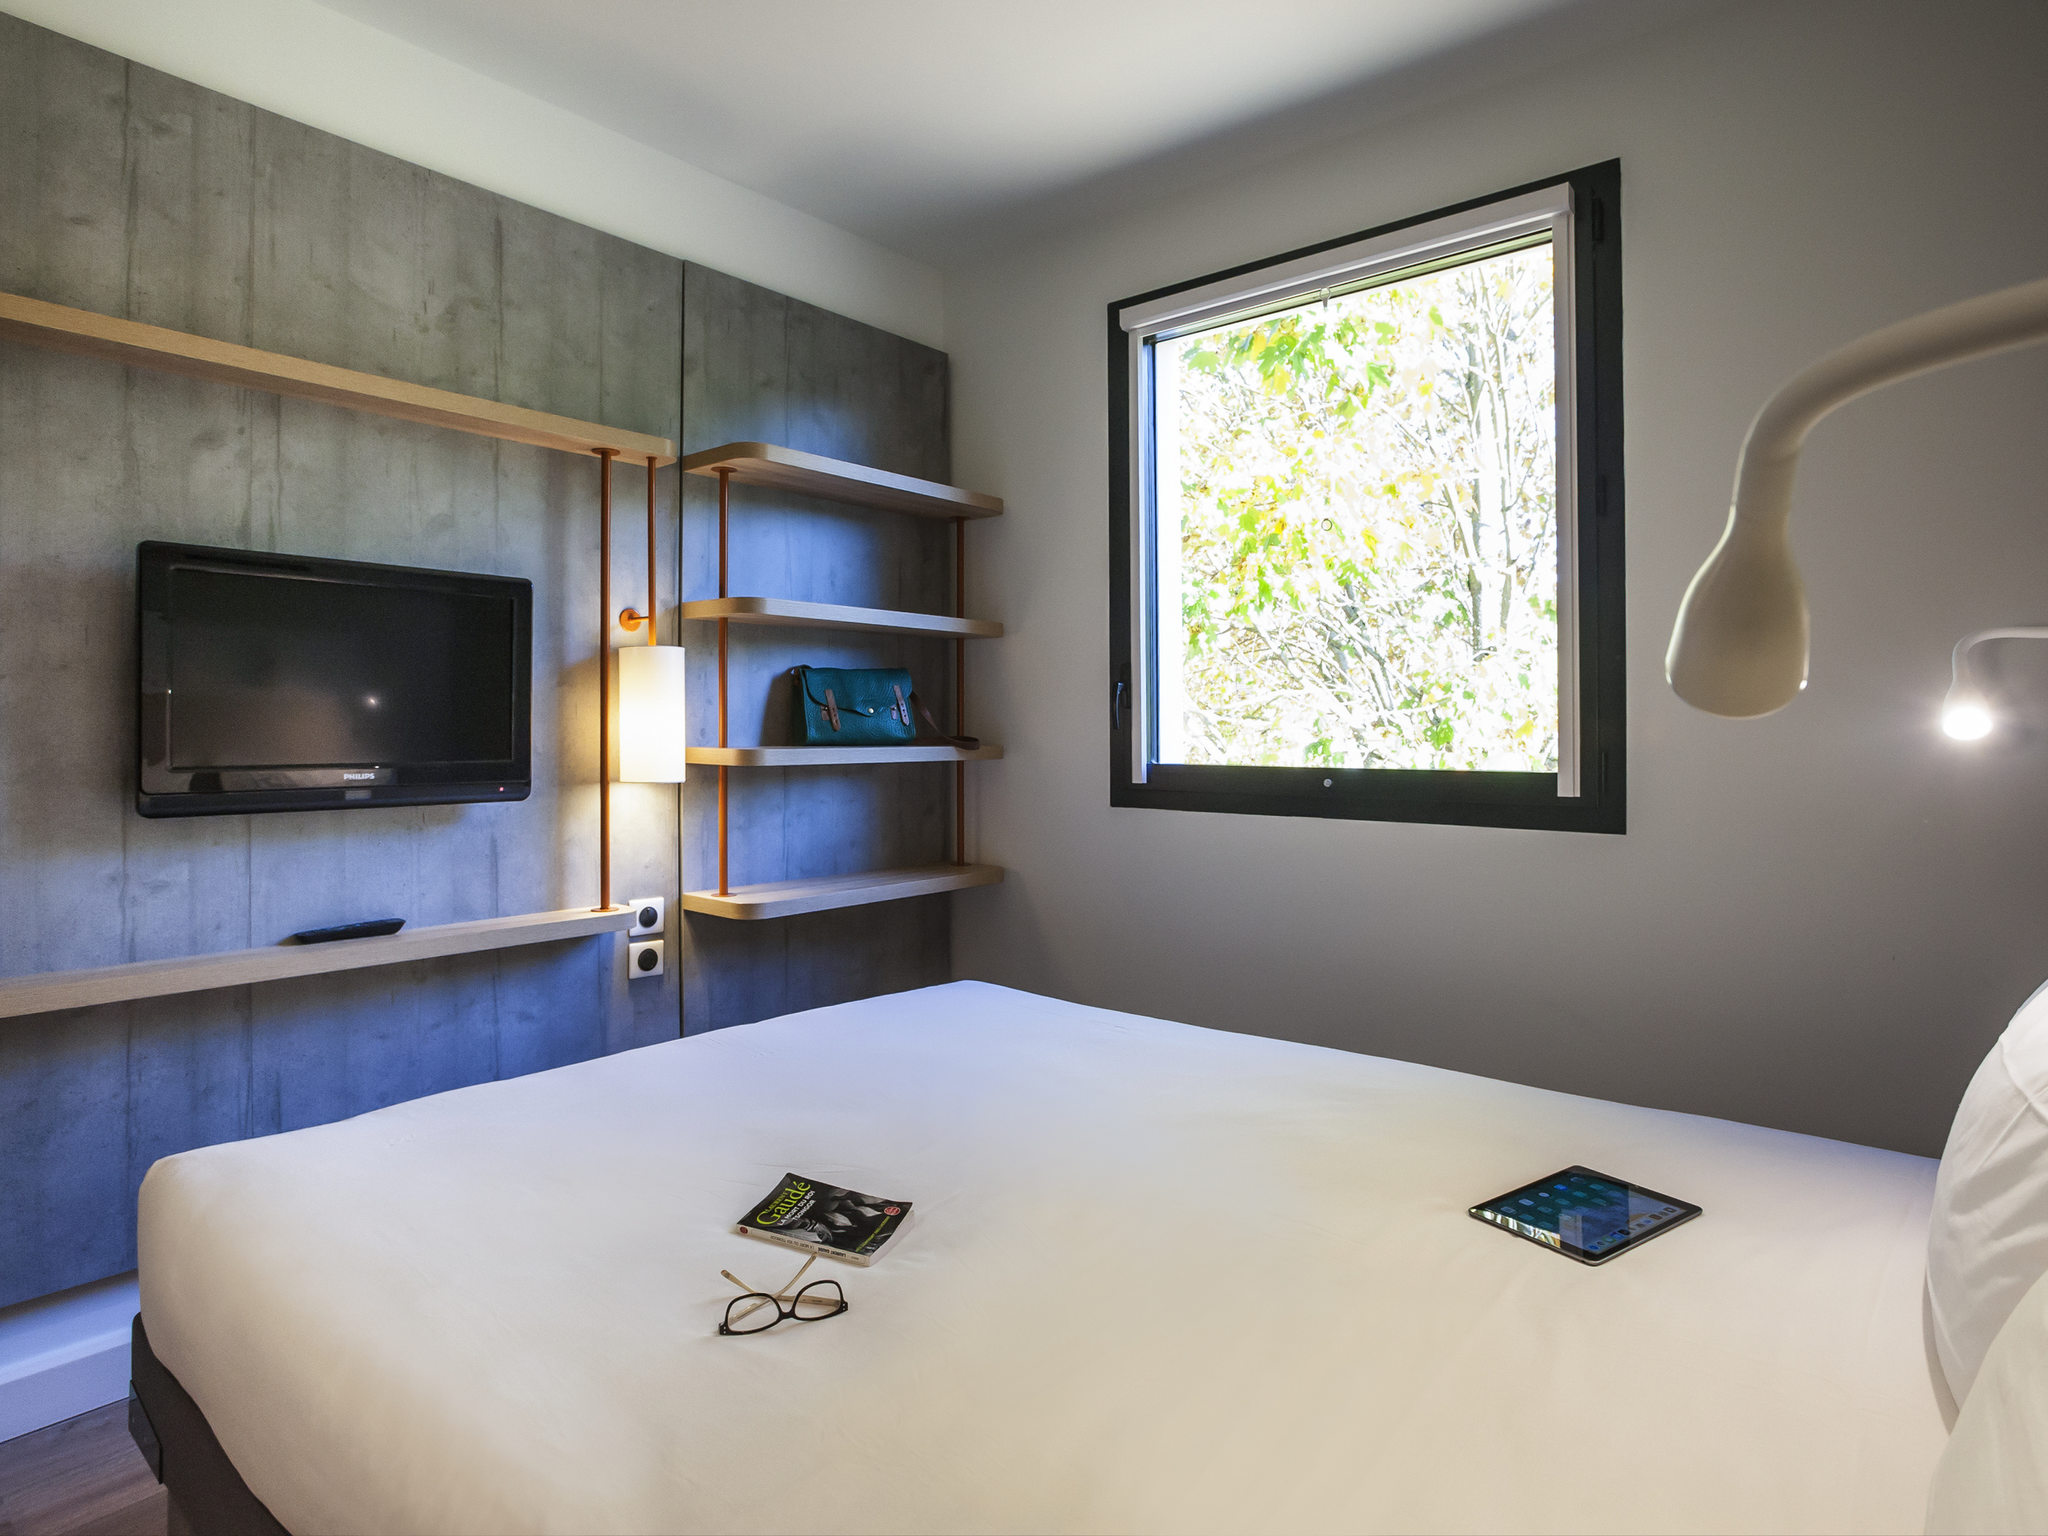 Hotel - ibis budget Chateau Thierry (Eröffnung: Juni 2018)